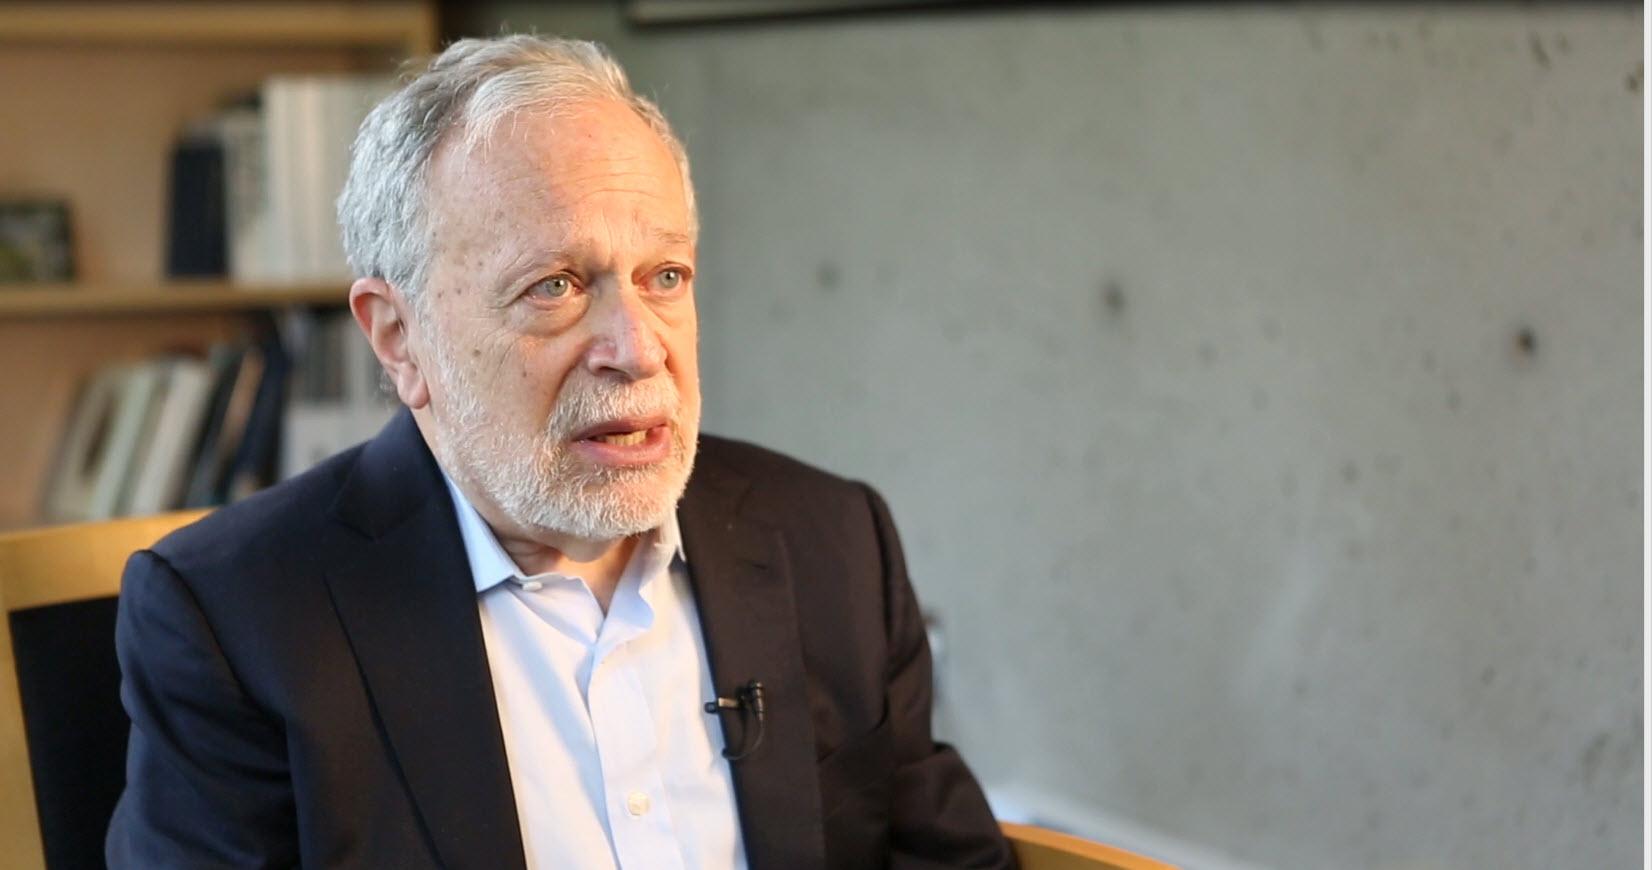 Interview with Professor Robert Reich